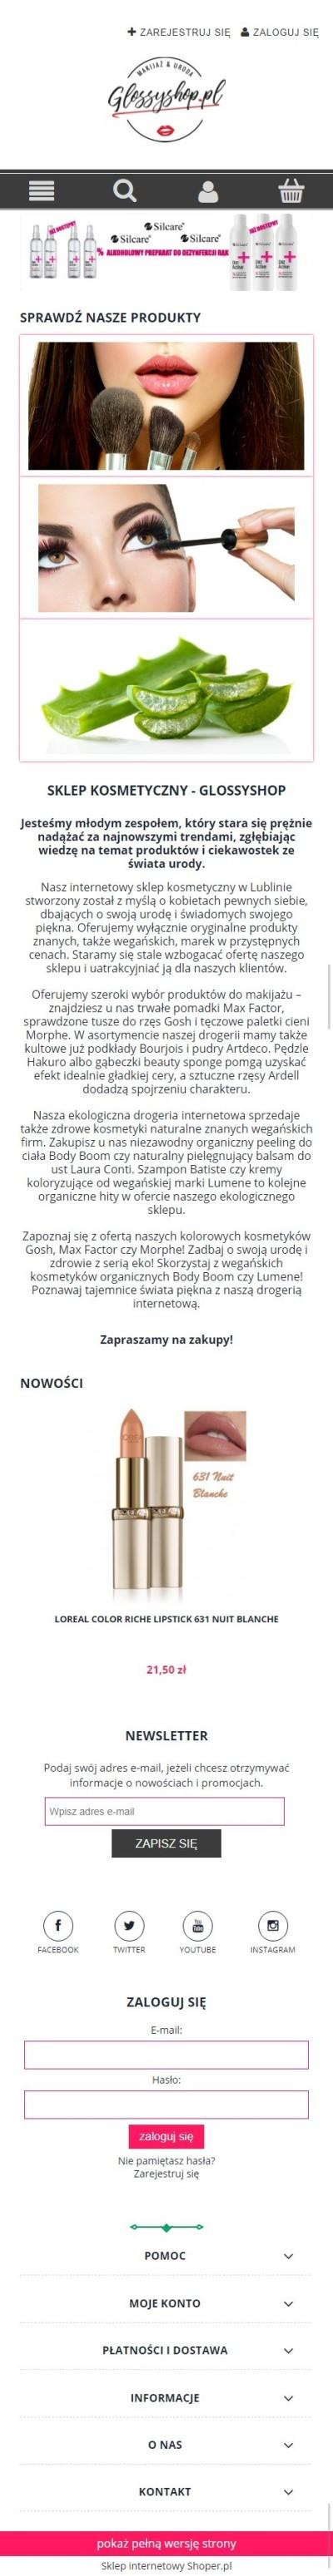 Sklep internetowy glossyshop.pl - zrzut mobile